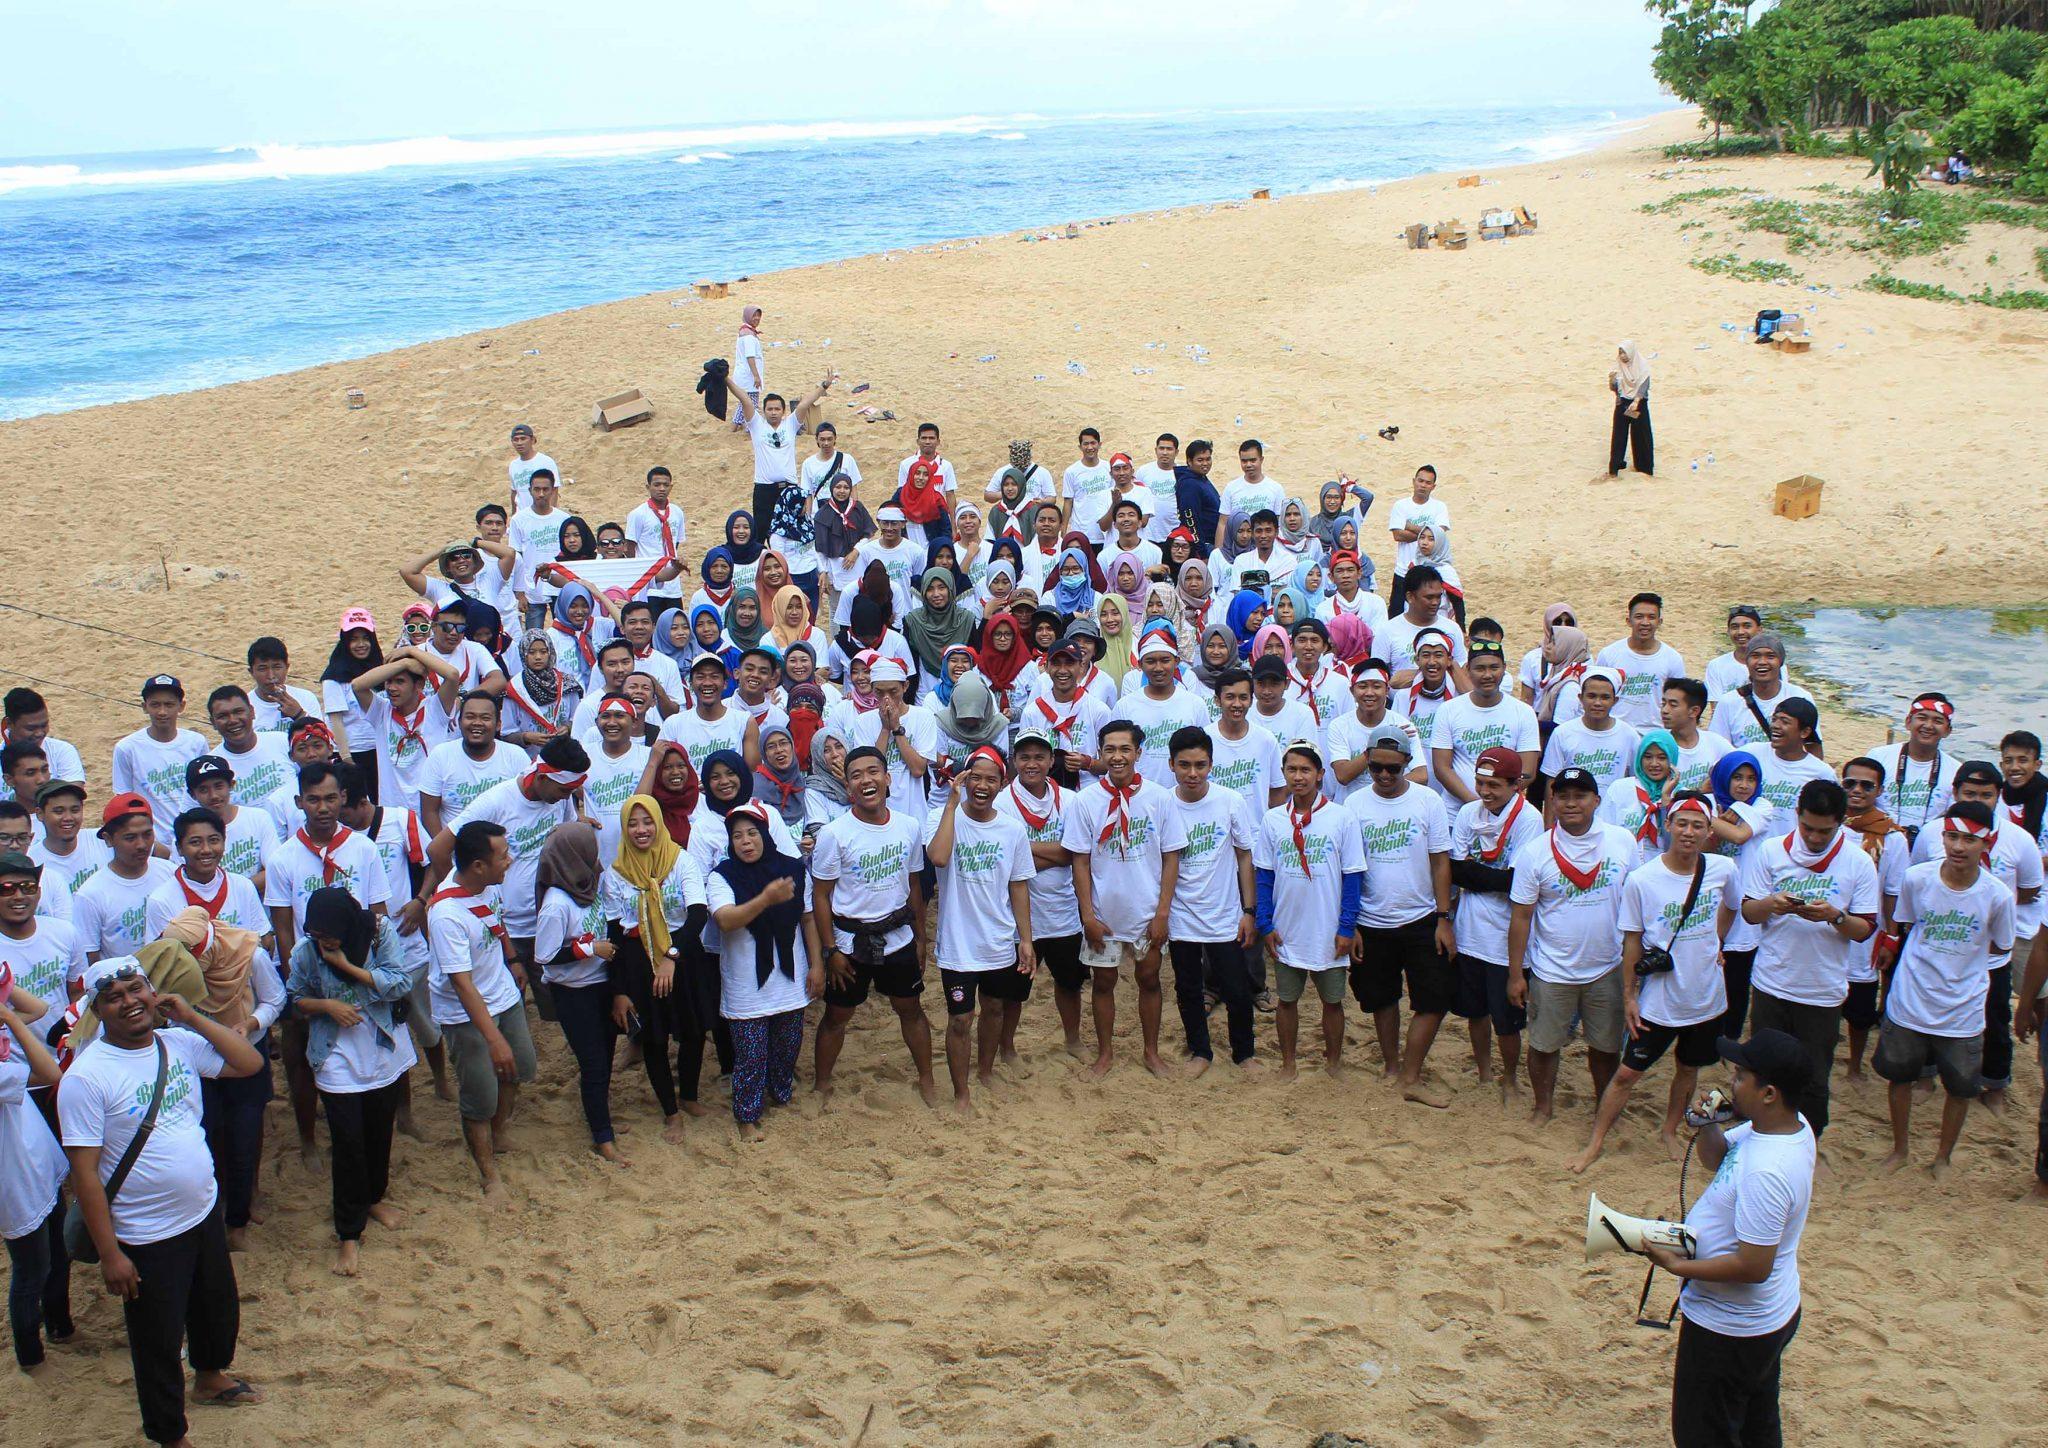 Outing Keluarga Besar Malang Strudel di Pantai Balekambang